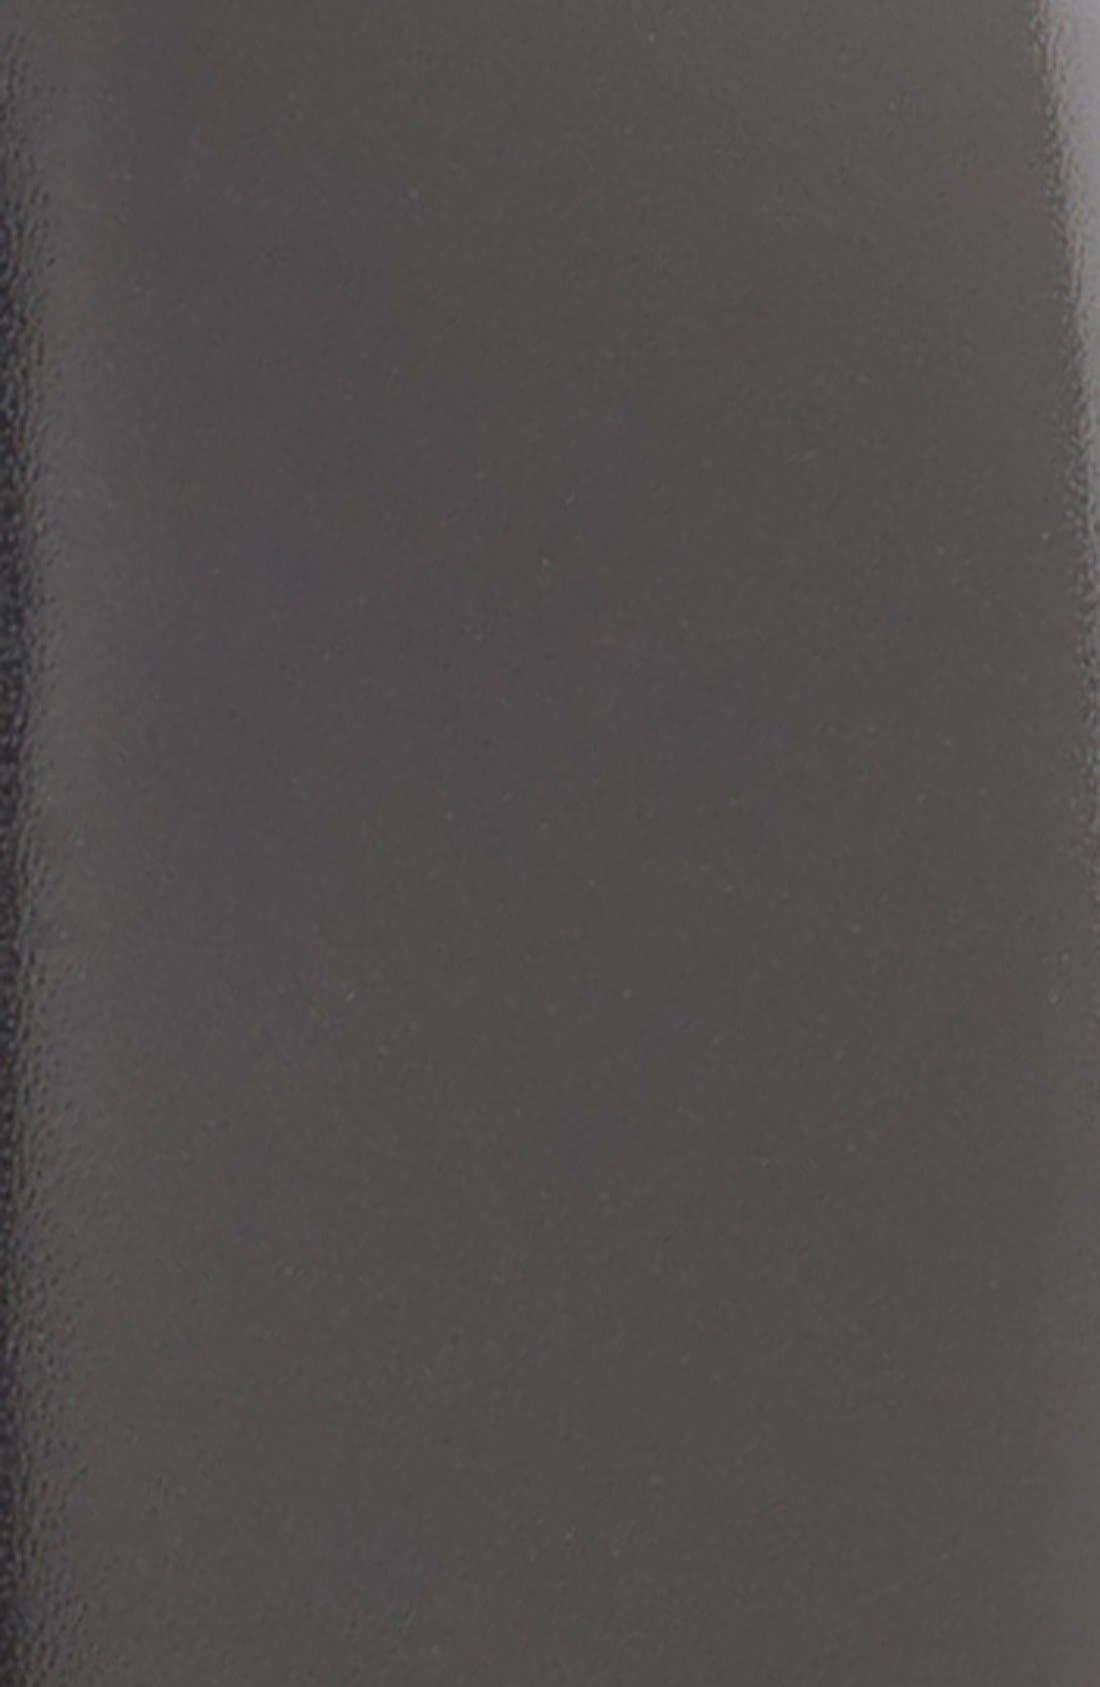 SALVATORE FERRAGAMO,                             Reversible Belt,                             Alternate thumbnail 4, color,                             004